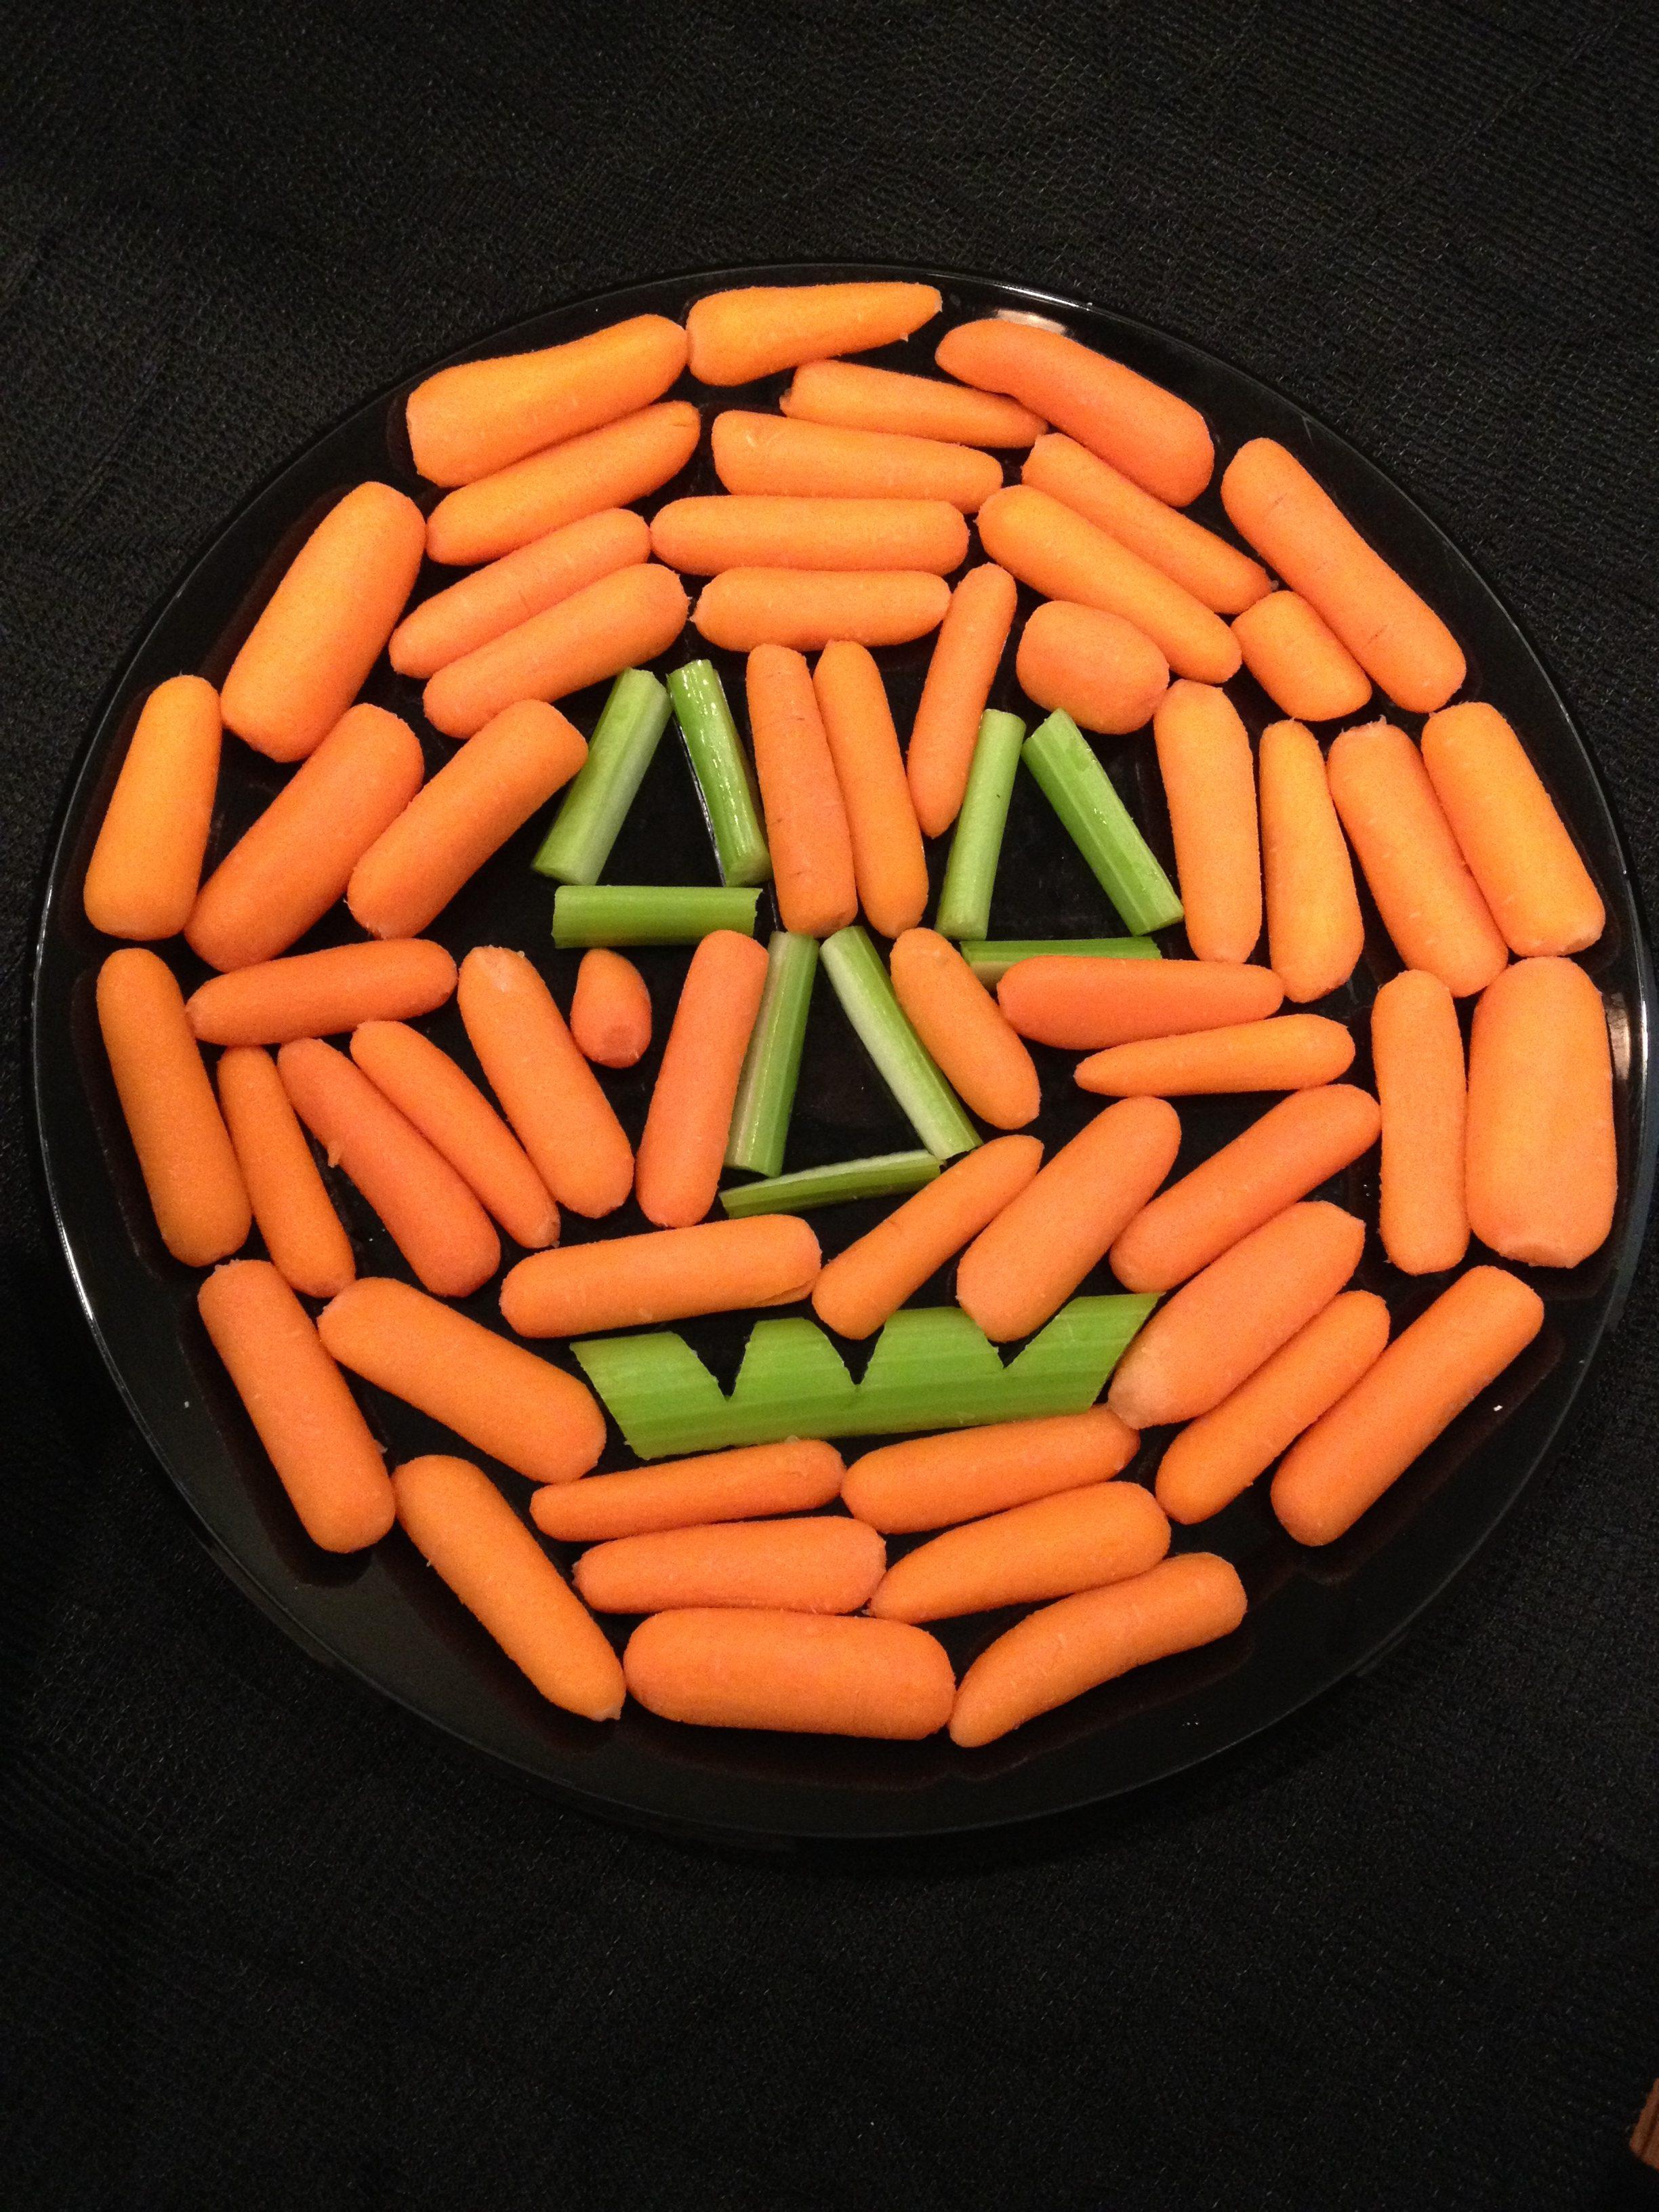 veggie-jack-o-lantern-healthy-halloween-treats